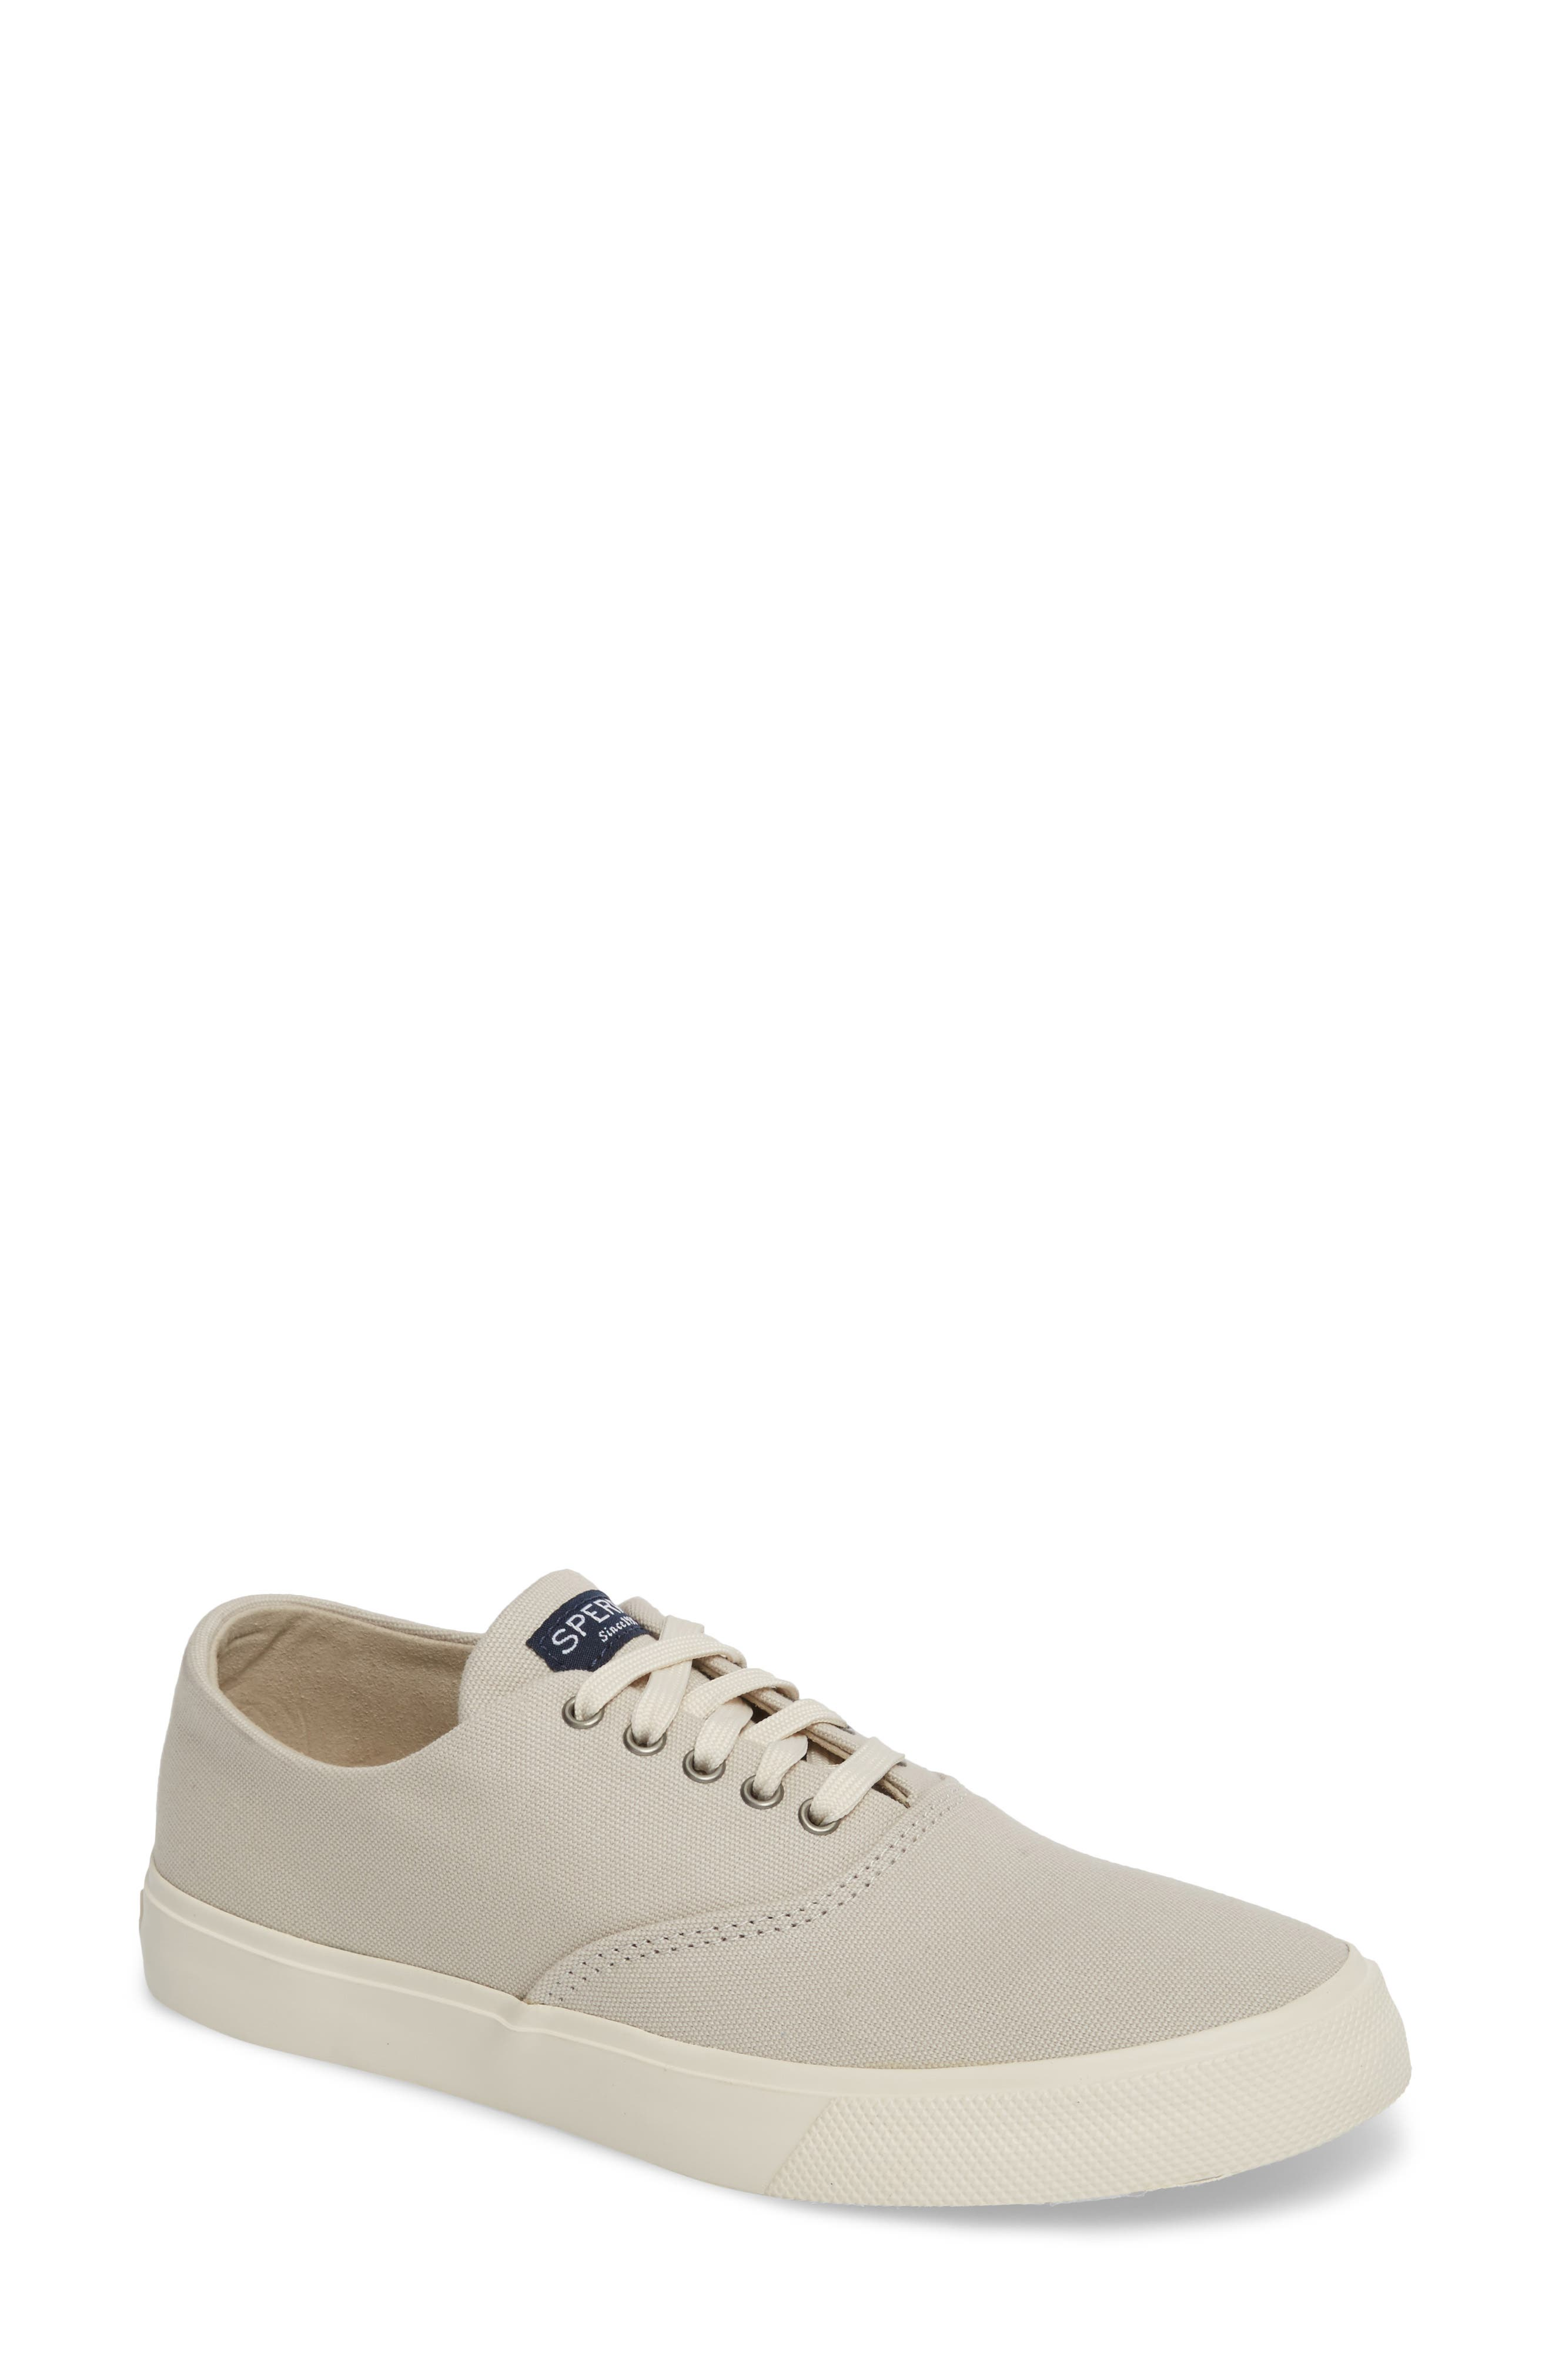 Captain's CVO Sneaker,                         Main,                         color, 050